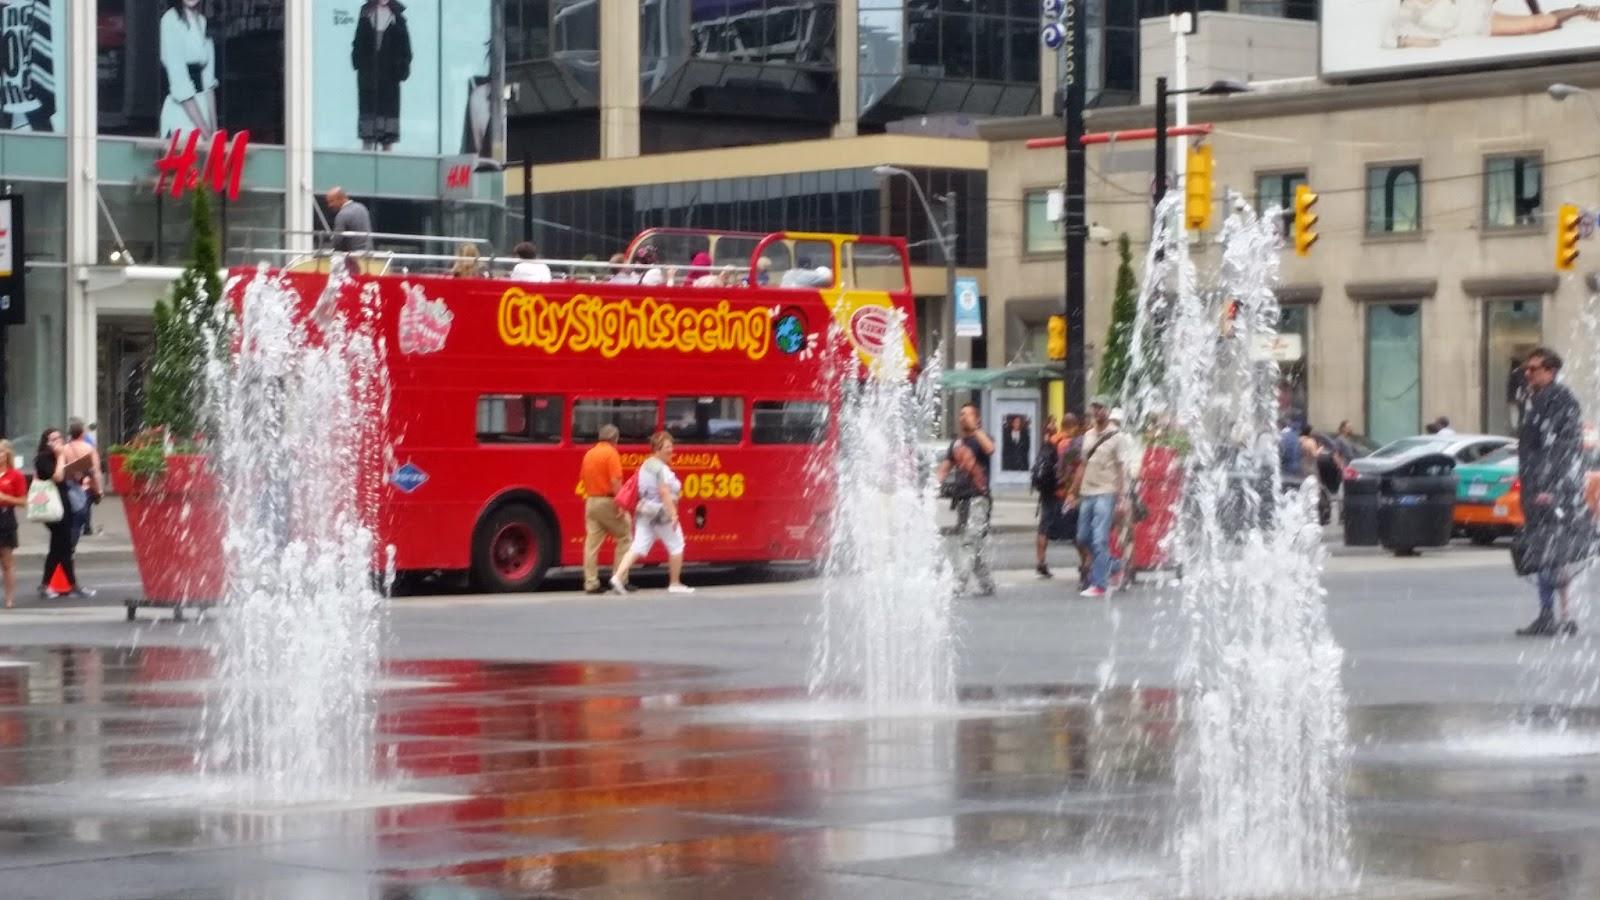 Sightseeing bus in Toronto